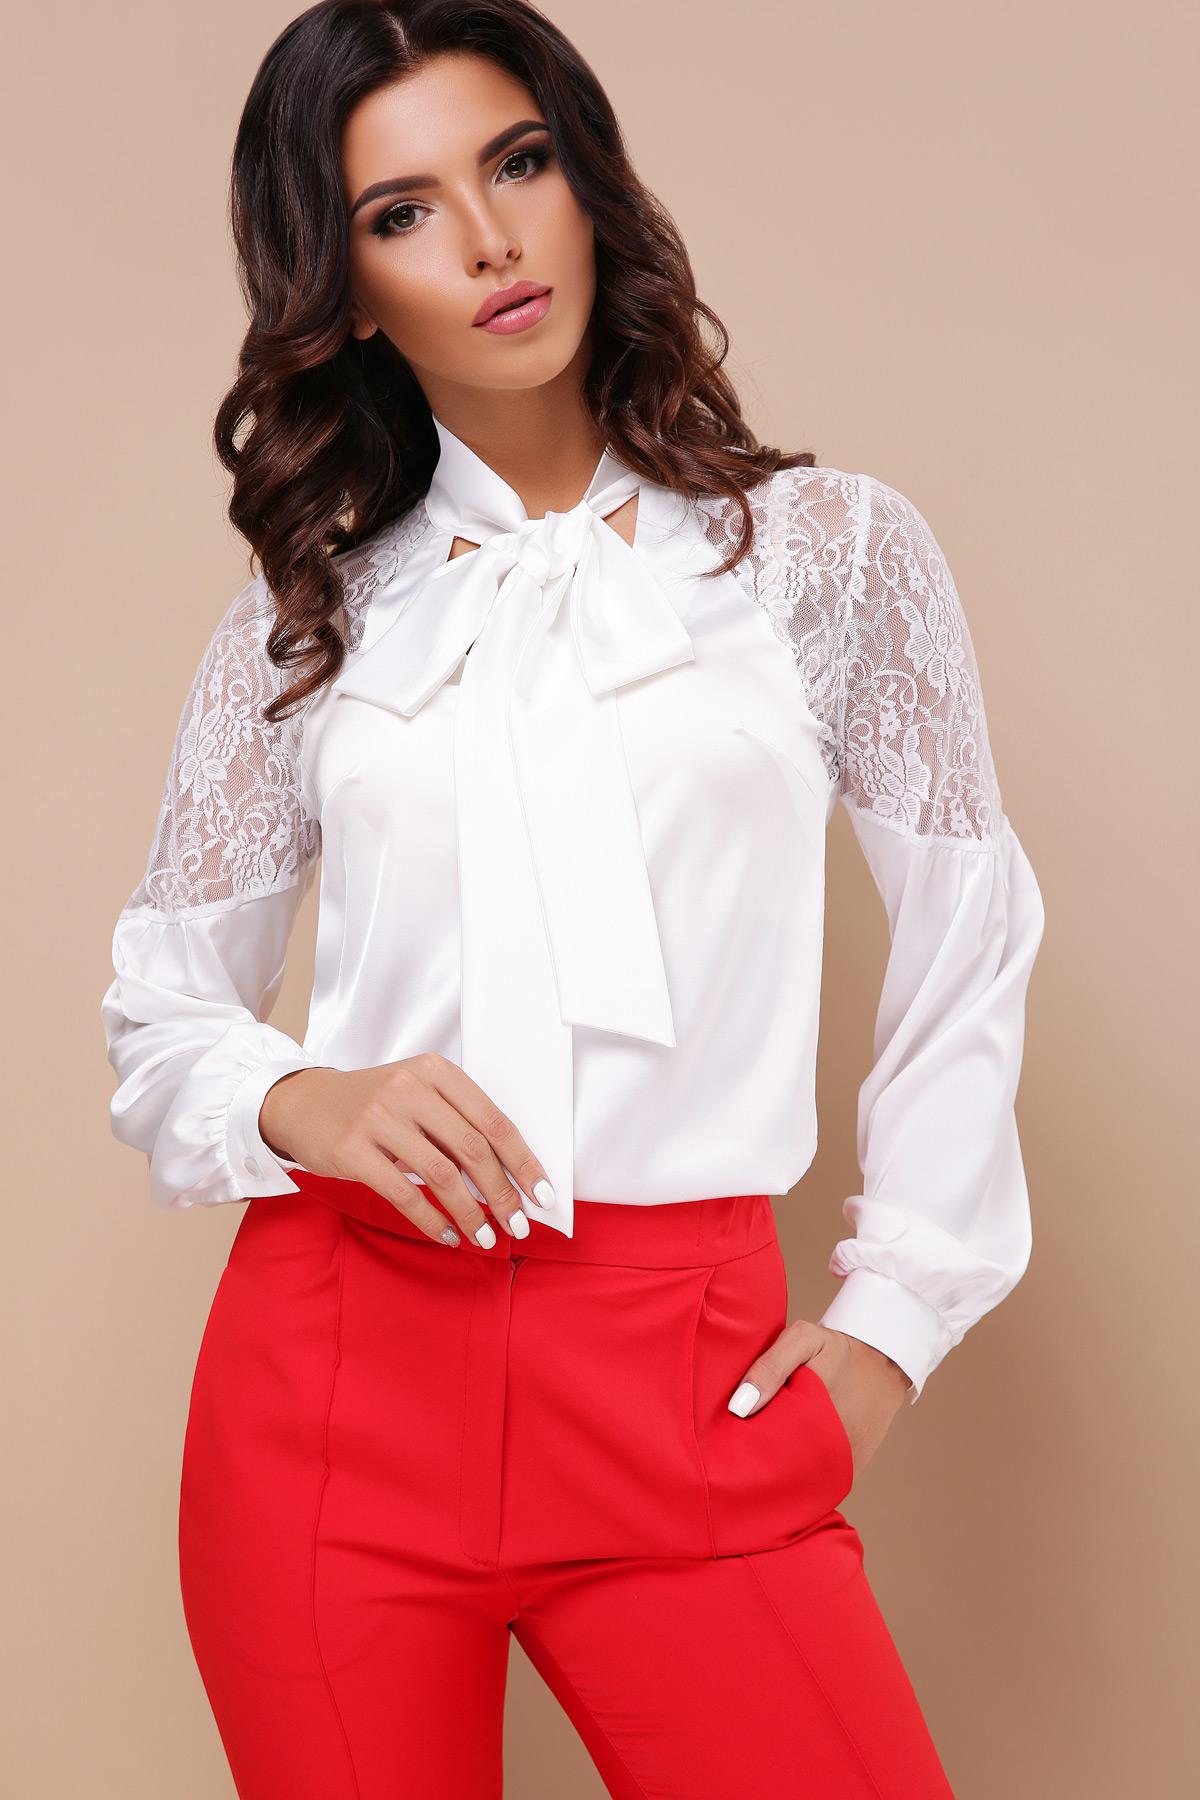 3db26c108cd шелковая блузка с кружевом. блуза Анастейша д р. Цвет  белый